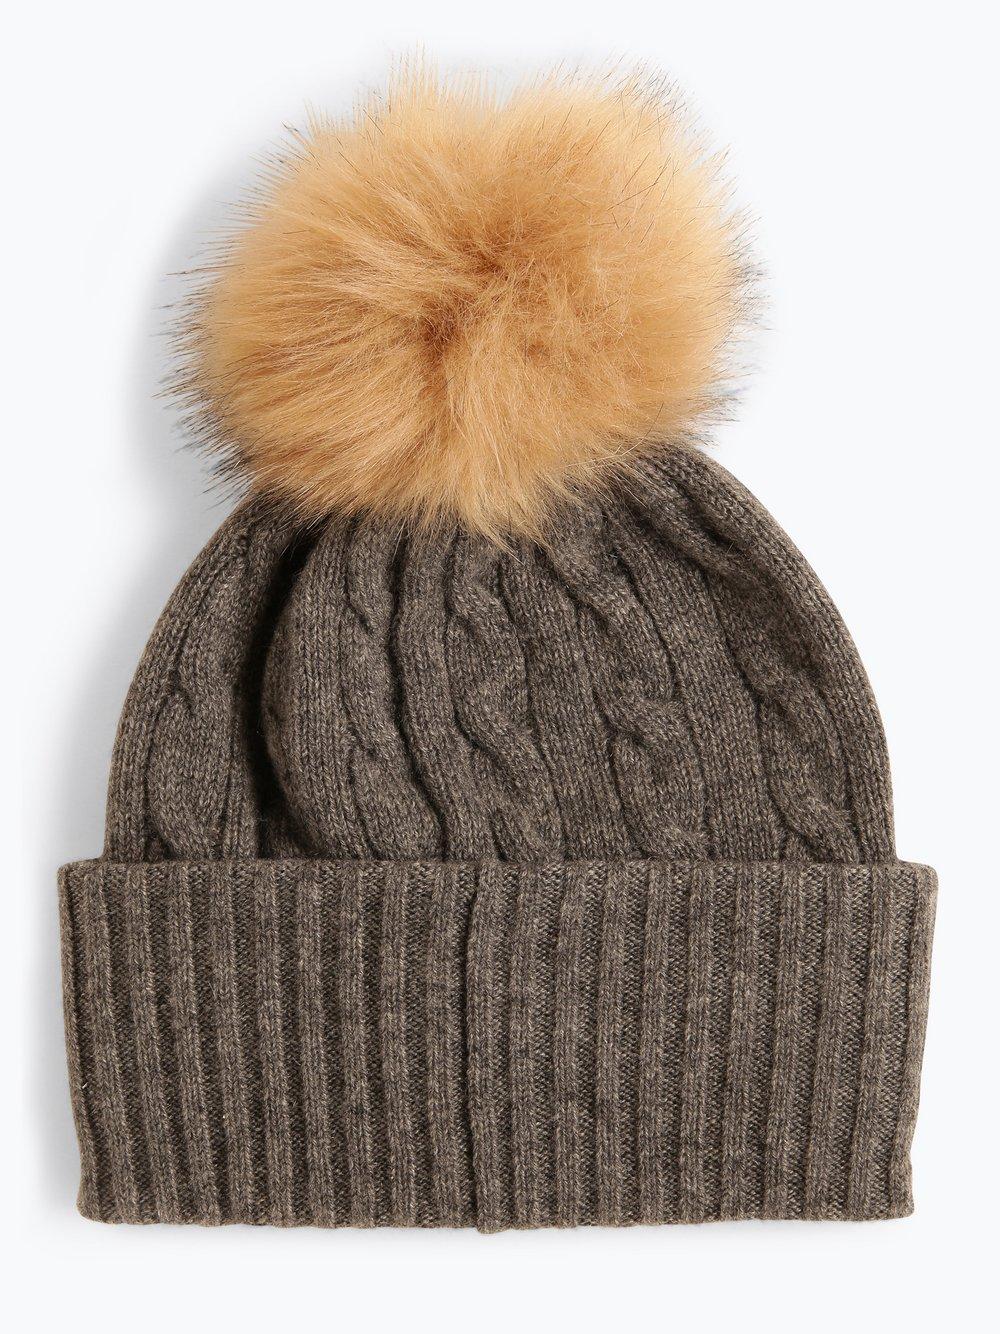 c0ed46a0ab9609 Polo Ralph Lauren Damen Pure Cashmere Mütze online kaufen | VANGRAAF.COM